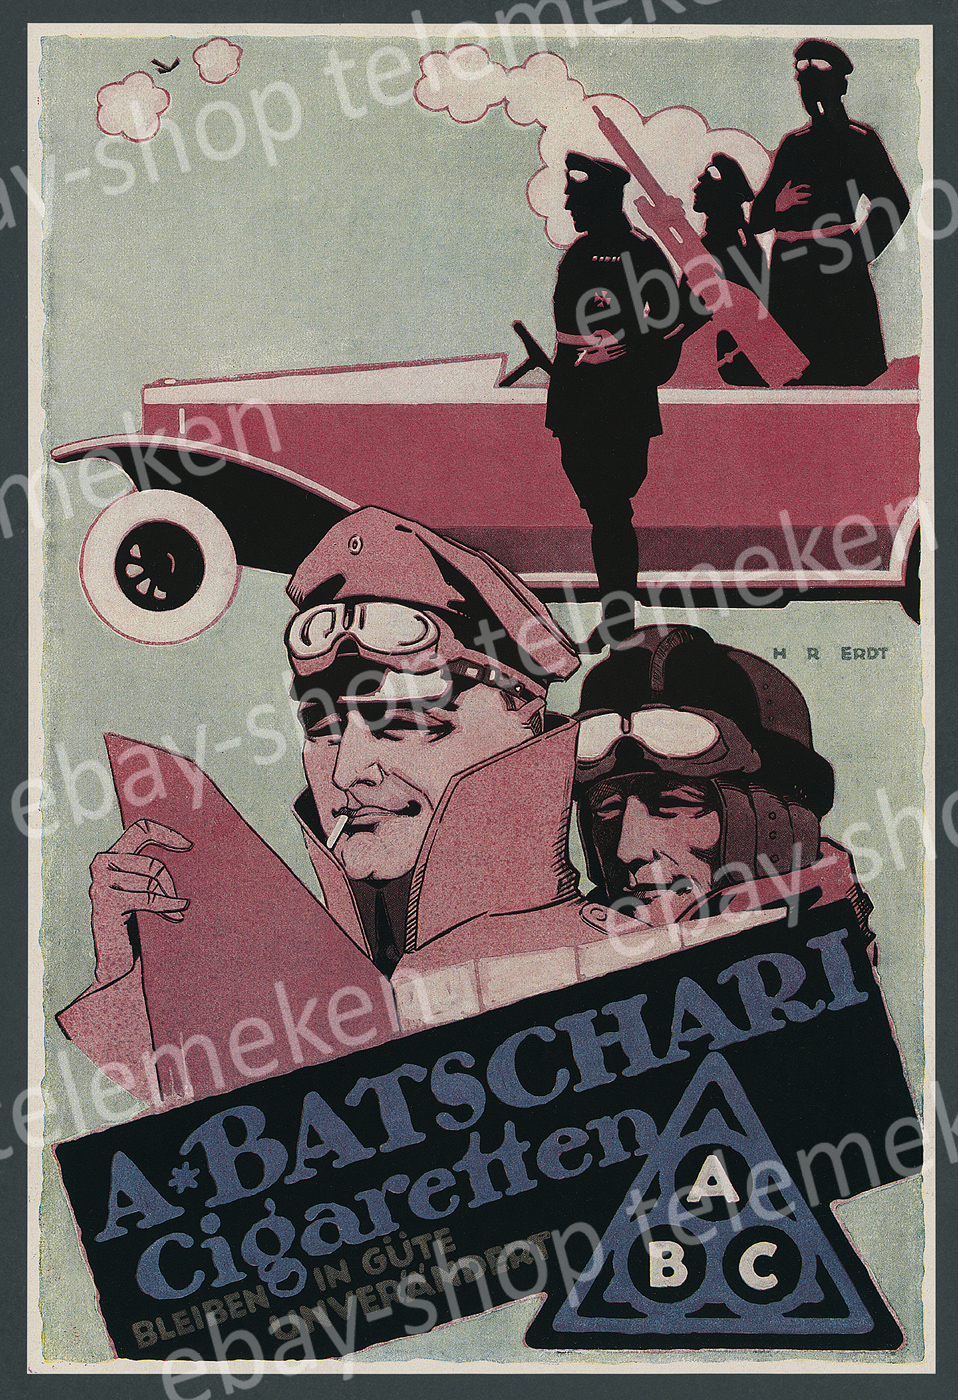 A2 Plakat Fallschirmjäger Paratroopers Bundeswehr Luftwaffe Poster Wehrmacht